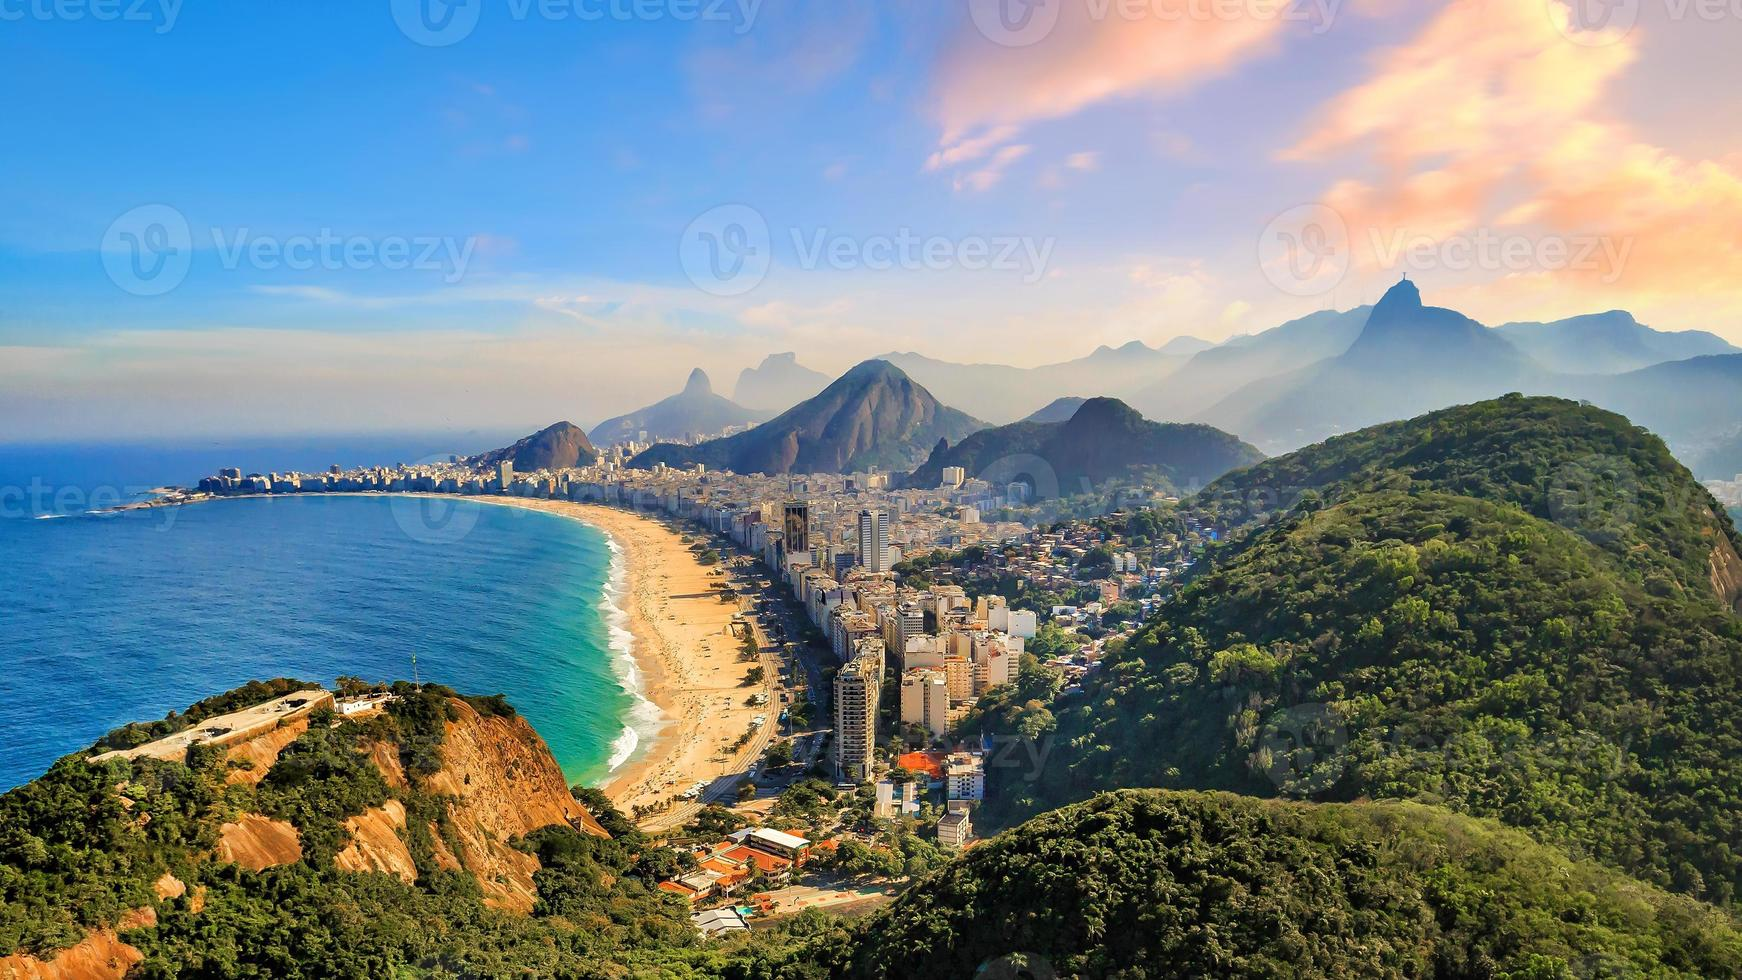 Copacabana-Strand und Ipanema-Strand in Rio de Janeiro, Brasilien foto